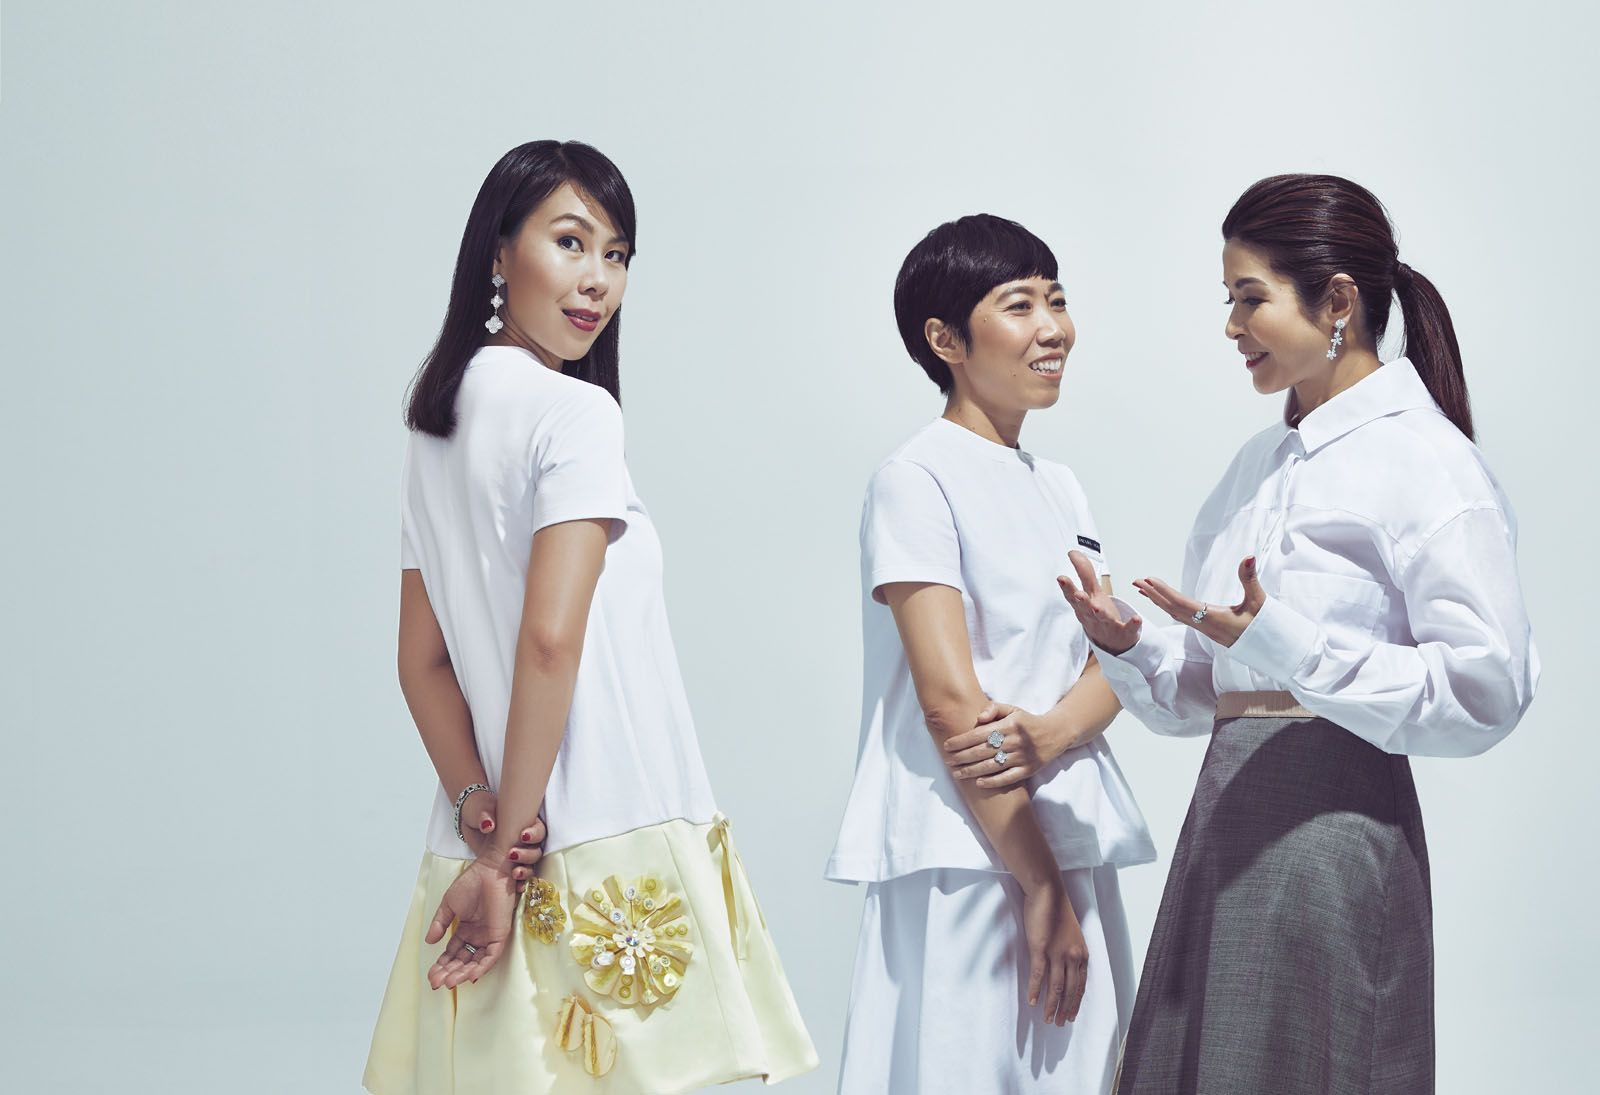 Bynd Artisan's Winnie Chan On Building An Artisanal Homegrown Brand